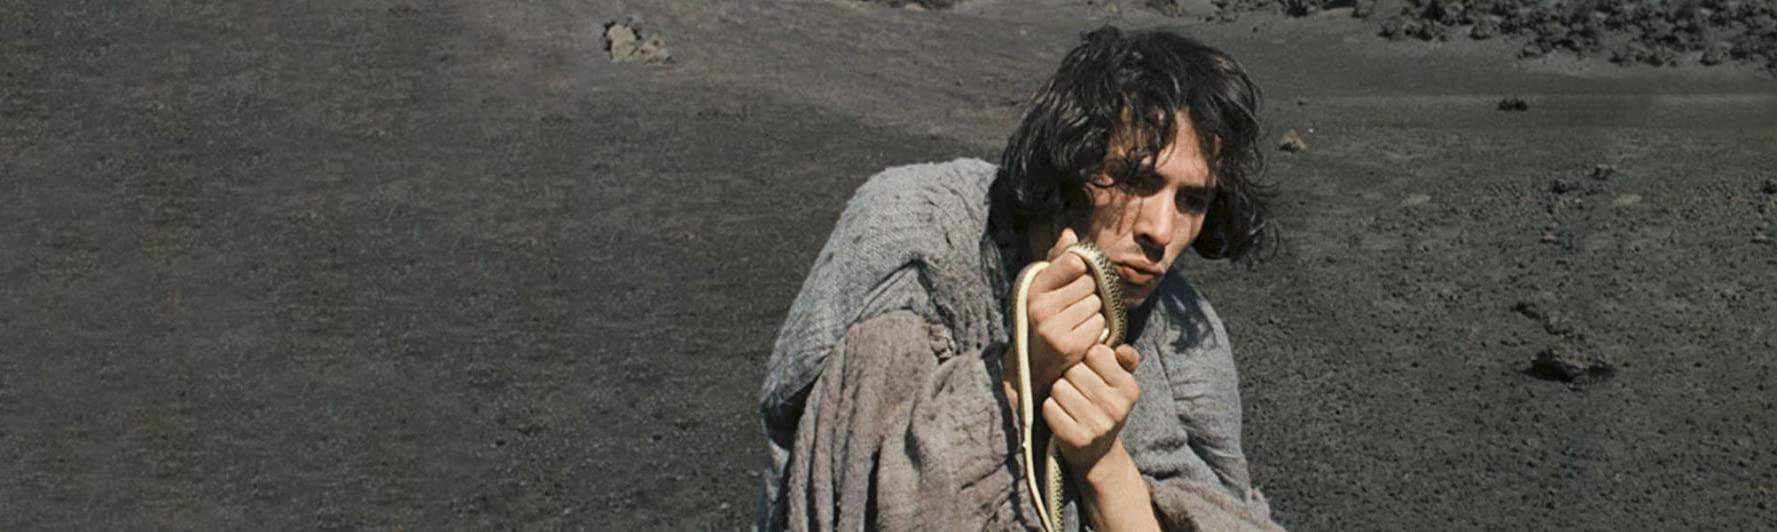 Porcile 4 - نقد فیلم Porcile اثر پیر پائولو پازولینی